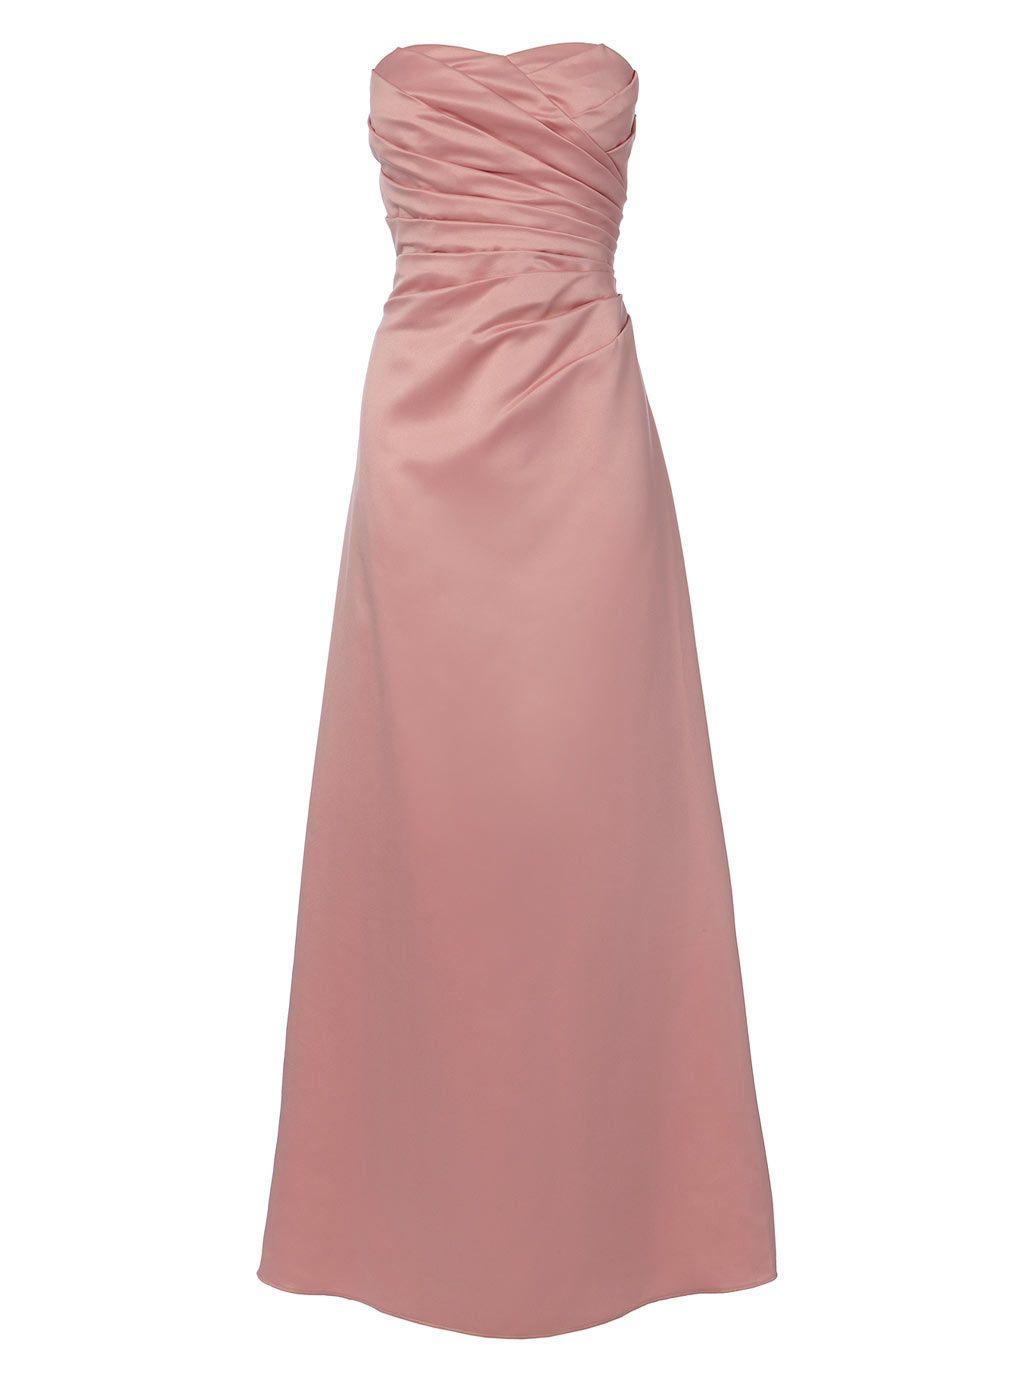 BHS Violetta Dusky Pink Satin Bridesmaid Dress £87.50 | Sisters ...